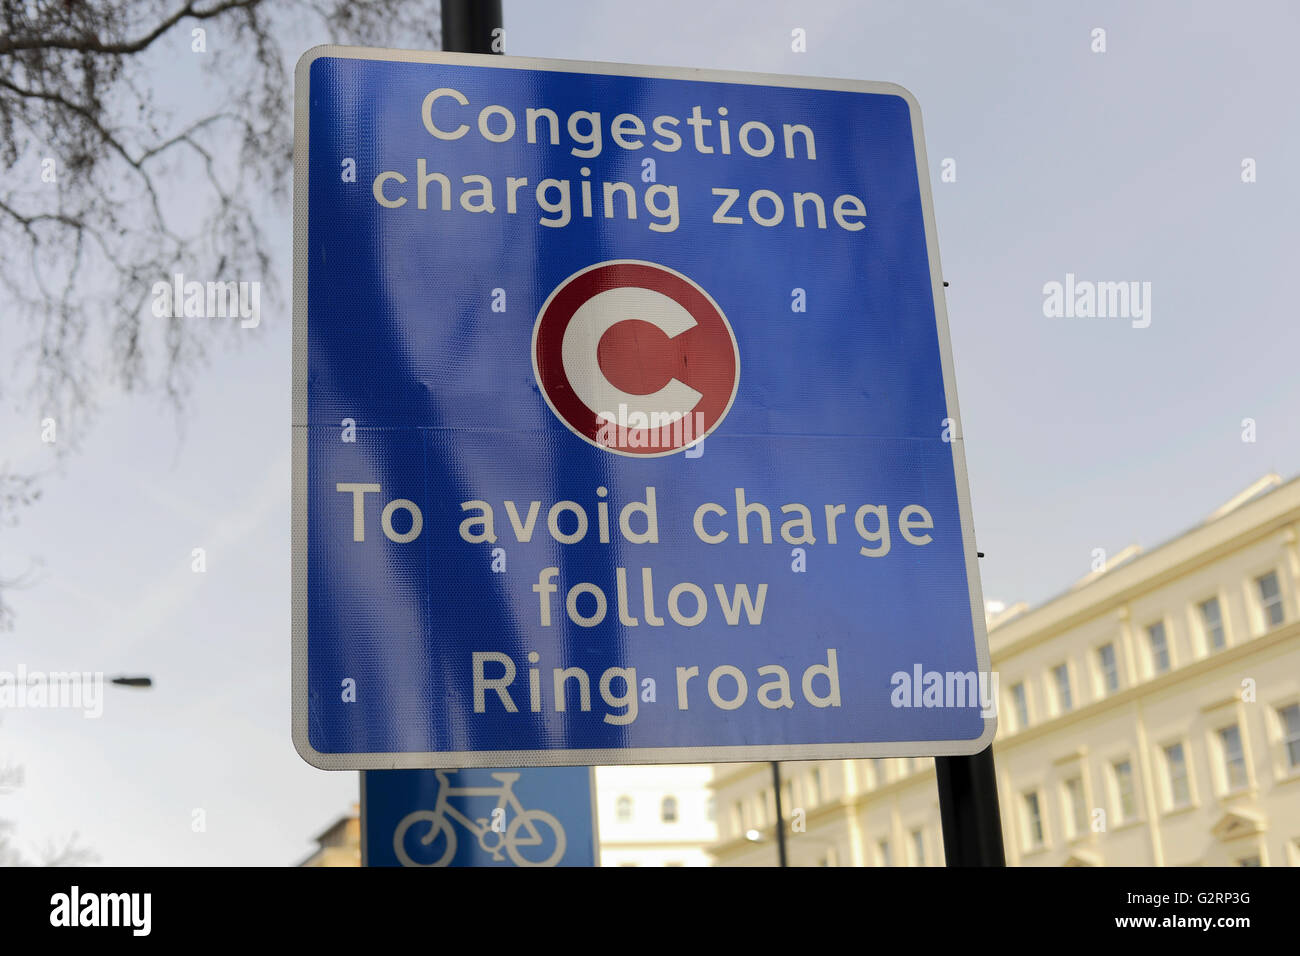 Congestion charging zone sign Pimlico London - Stock Image